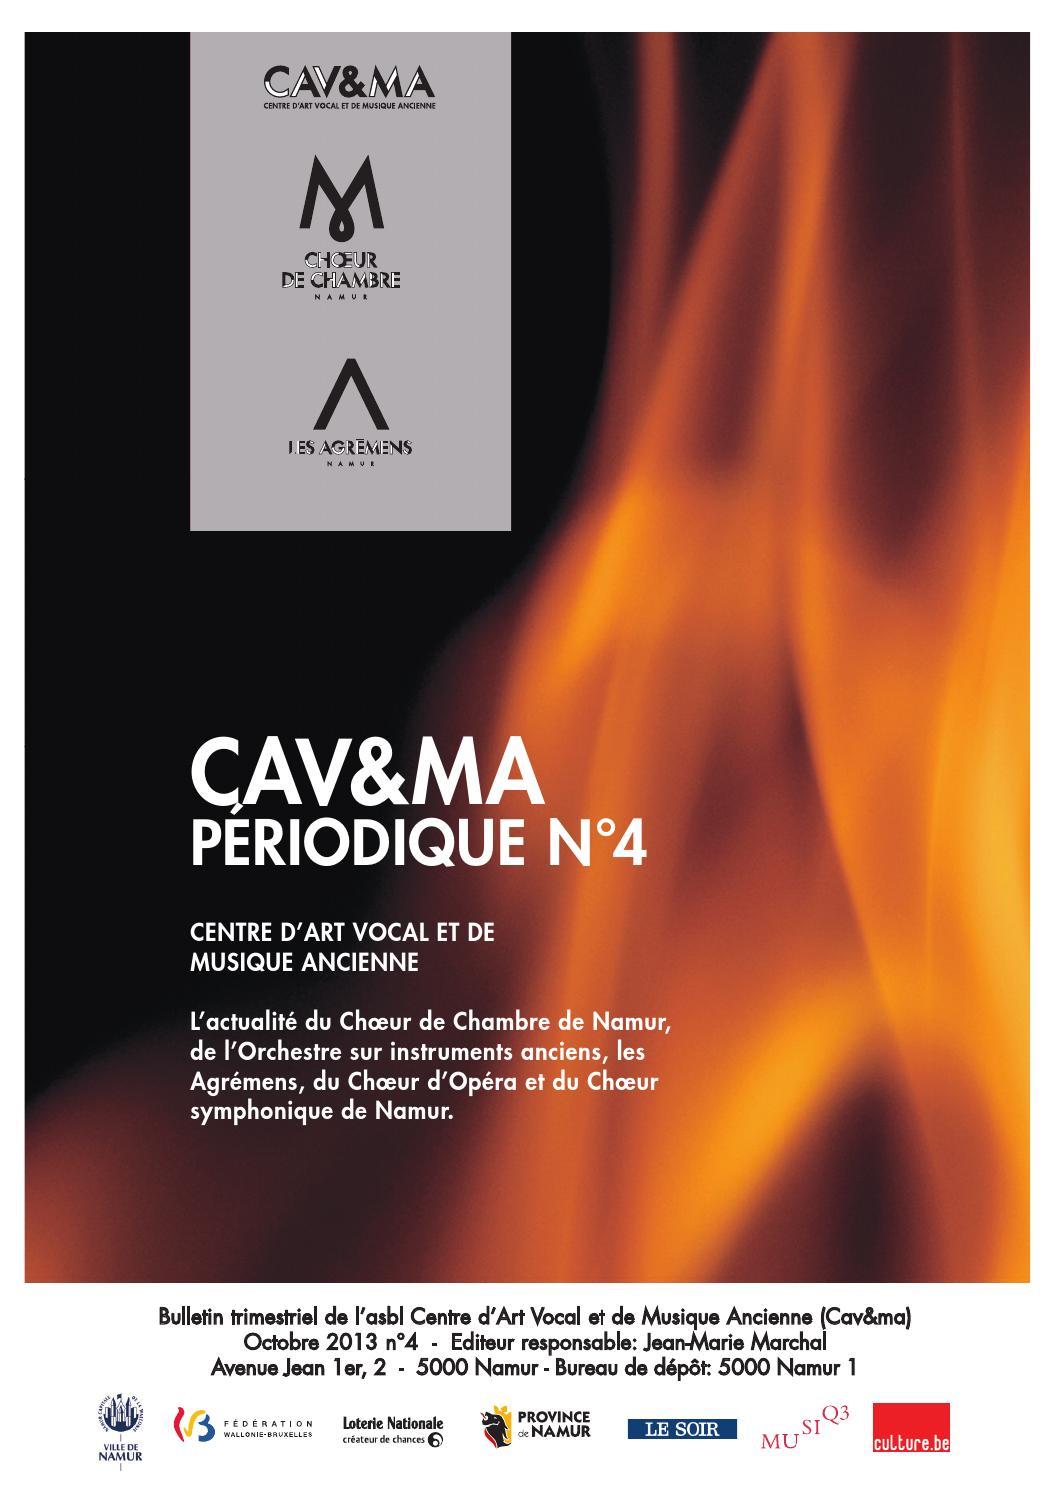 cavema le p riodique 4 by laurent cools issuu. Black Bedroom Furniture Sets. Home Design Ideas